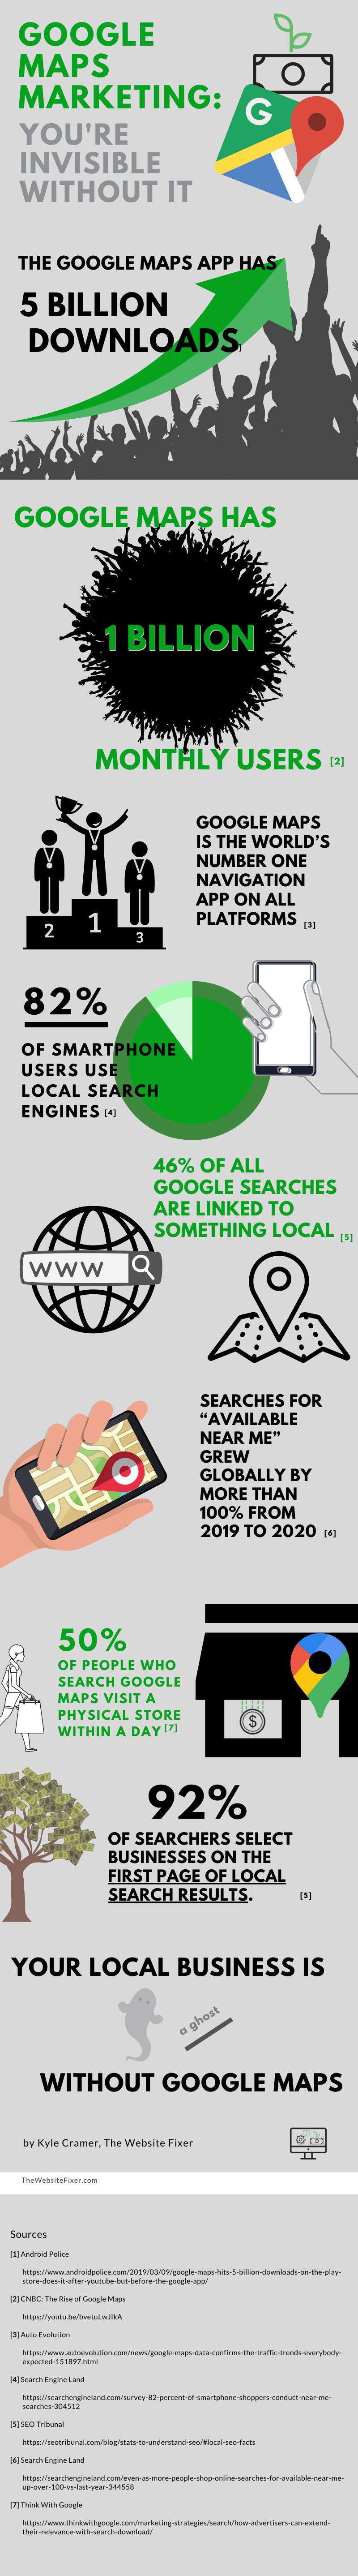 Google Maps Marketing Infographic